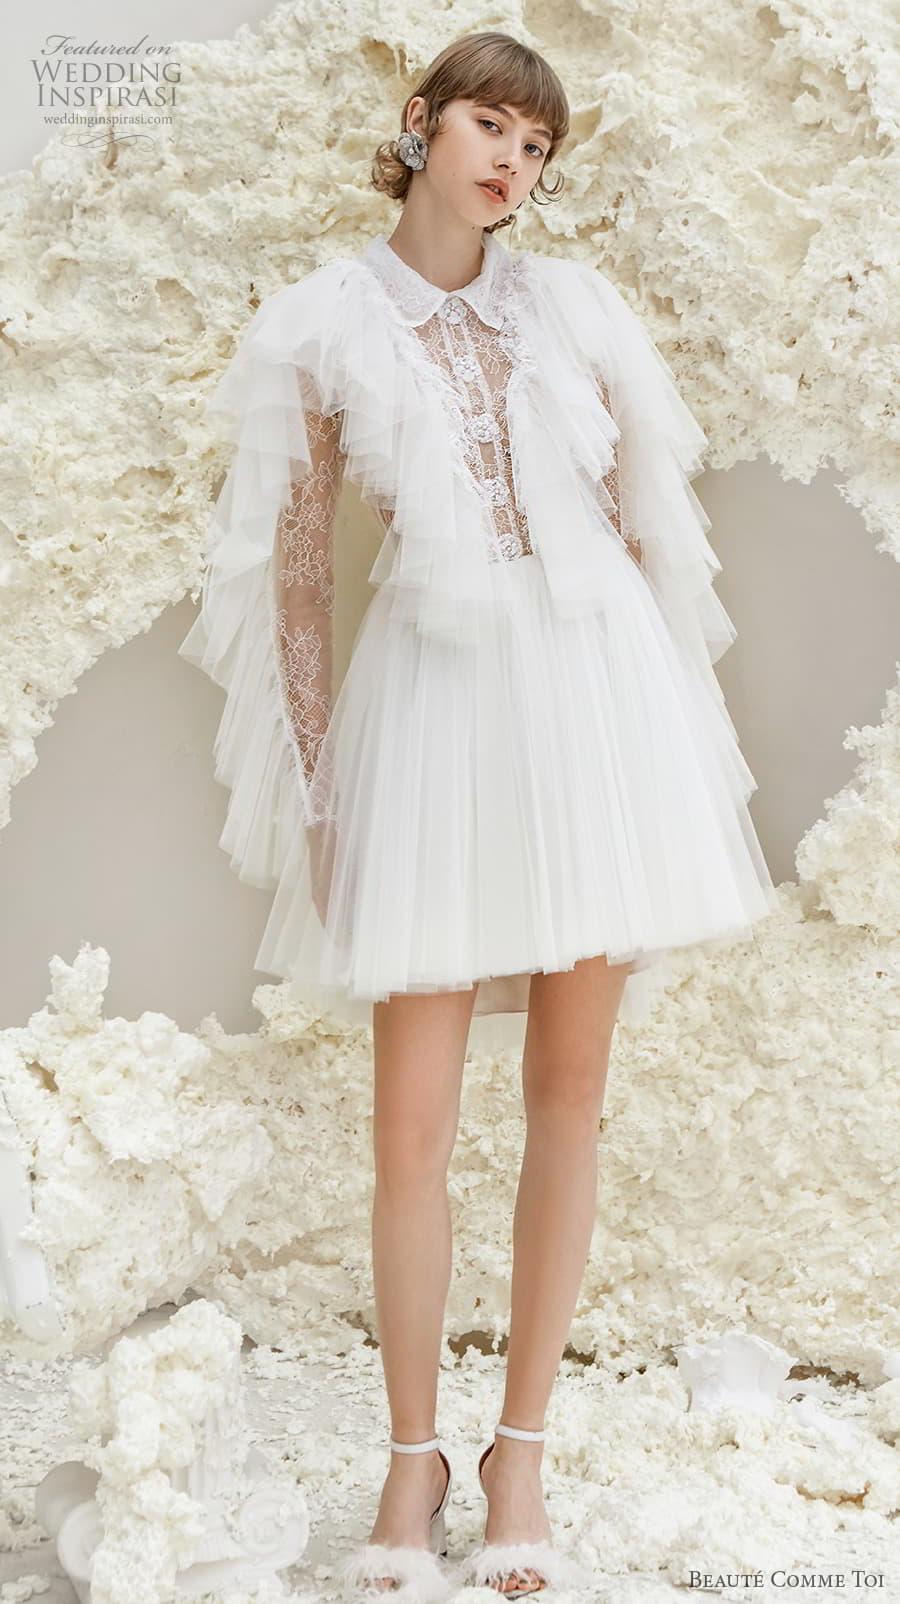 beaute comme toi spring 2022 bridal long tiered sleeves collar neck heavily embellished bodice pretty short wedding dress keyhole back (maeve) mv